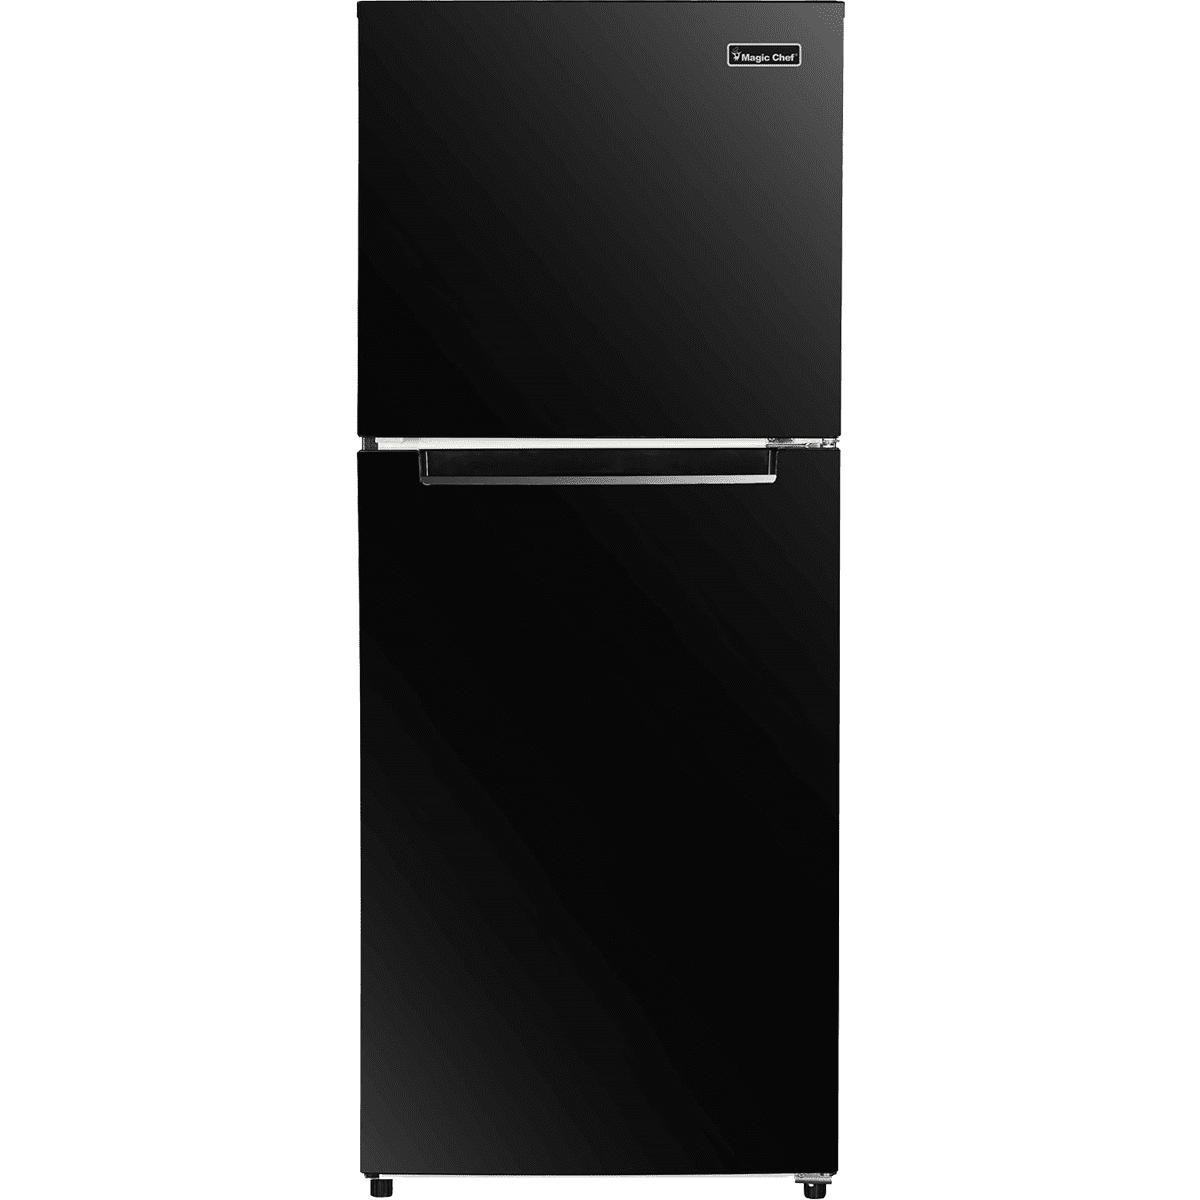 Image of Magic Chef 10.1 Cu. Ft. Energy Star Refrigerator - Black